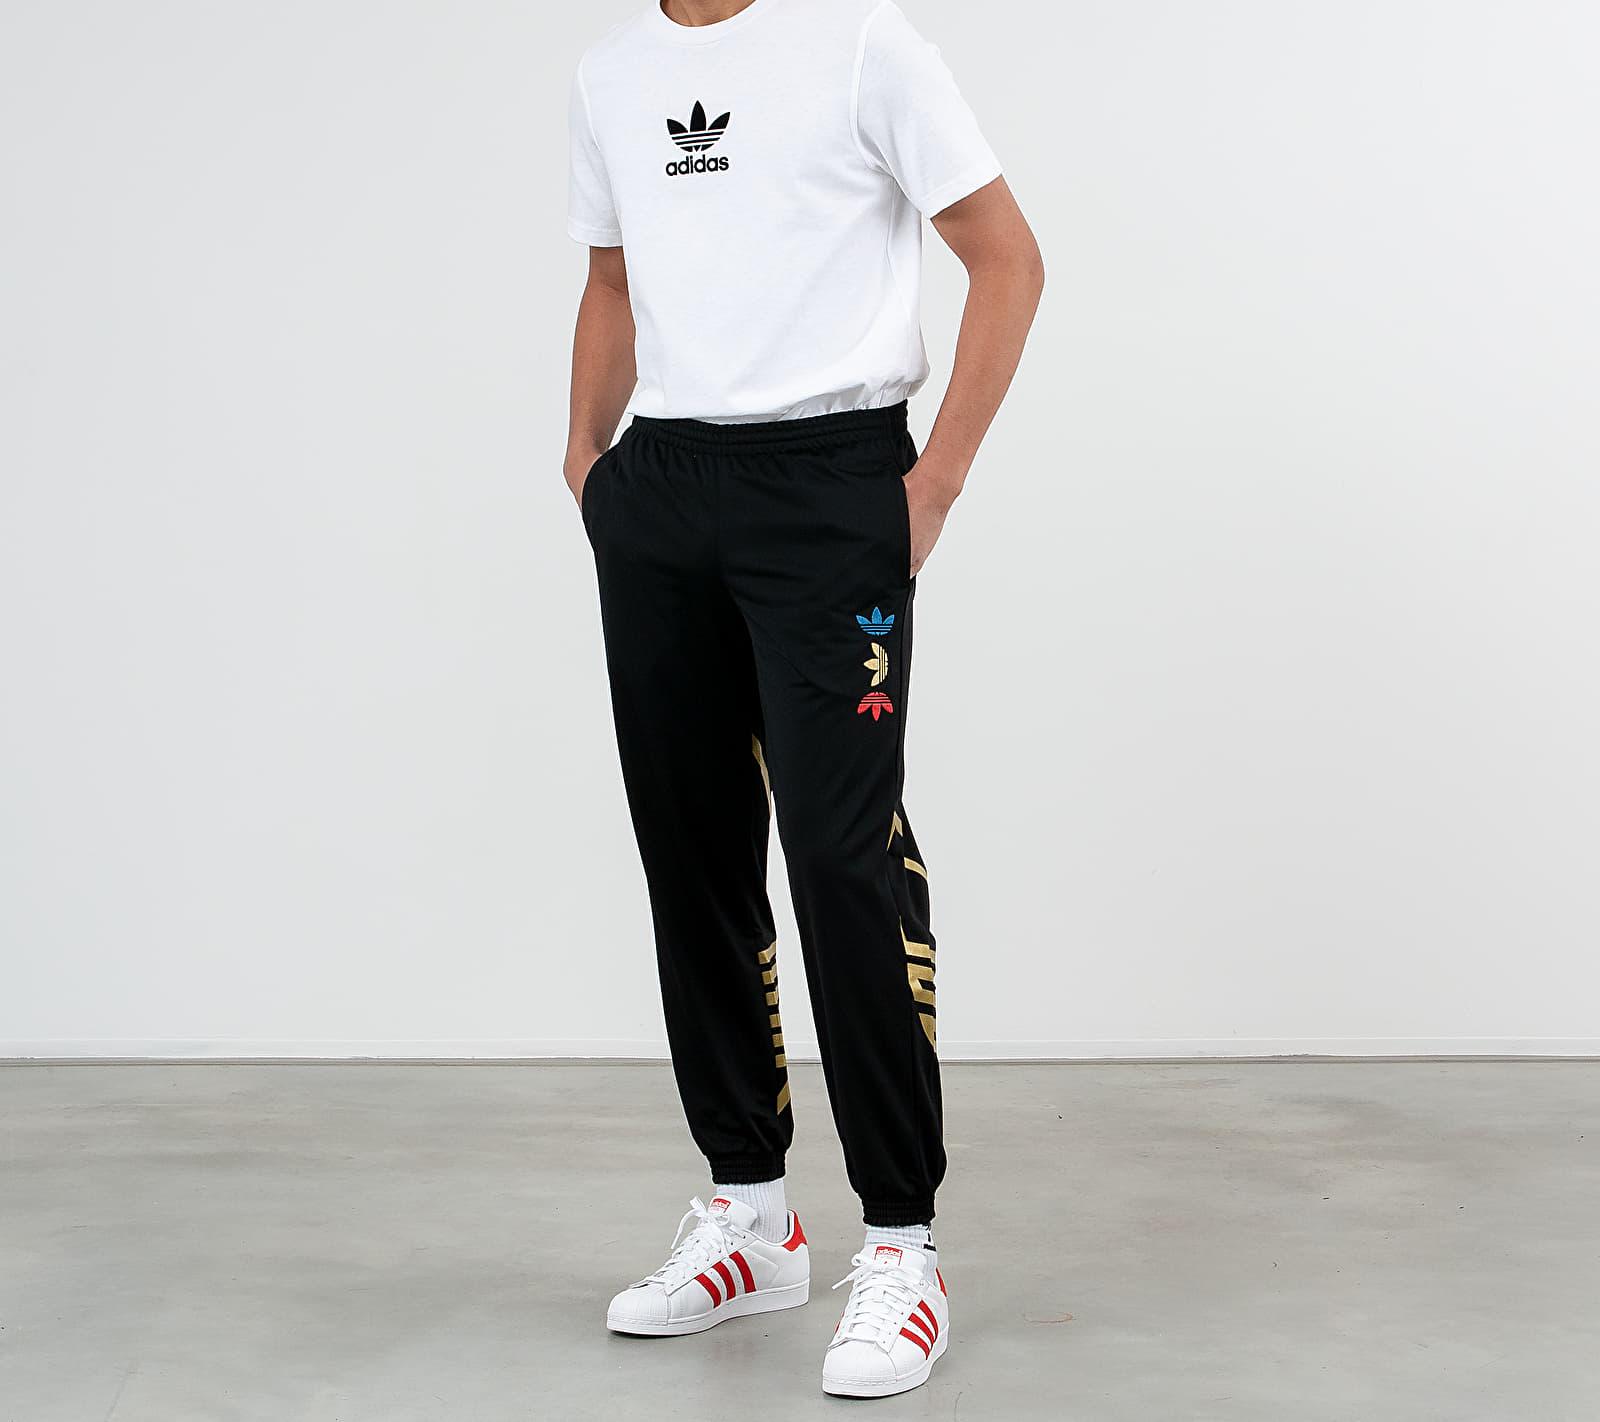 adidas Reflective/ Metallic Trackpants Black/ Platin Metallic